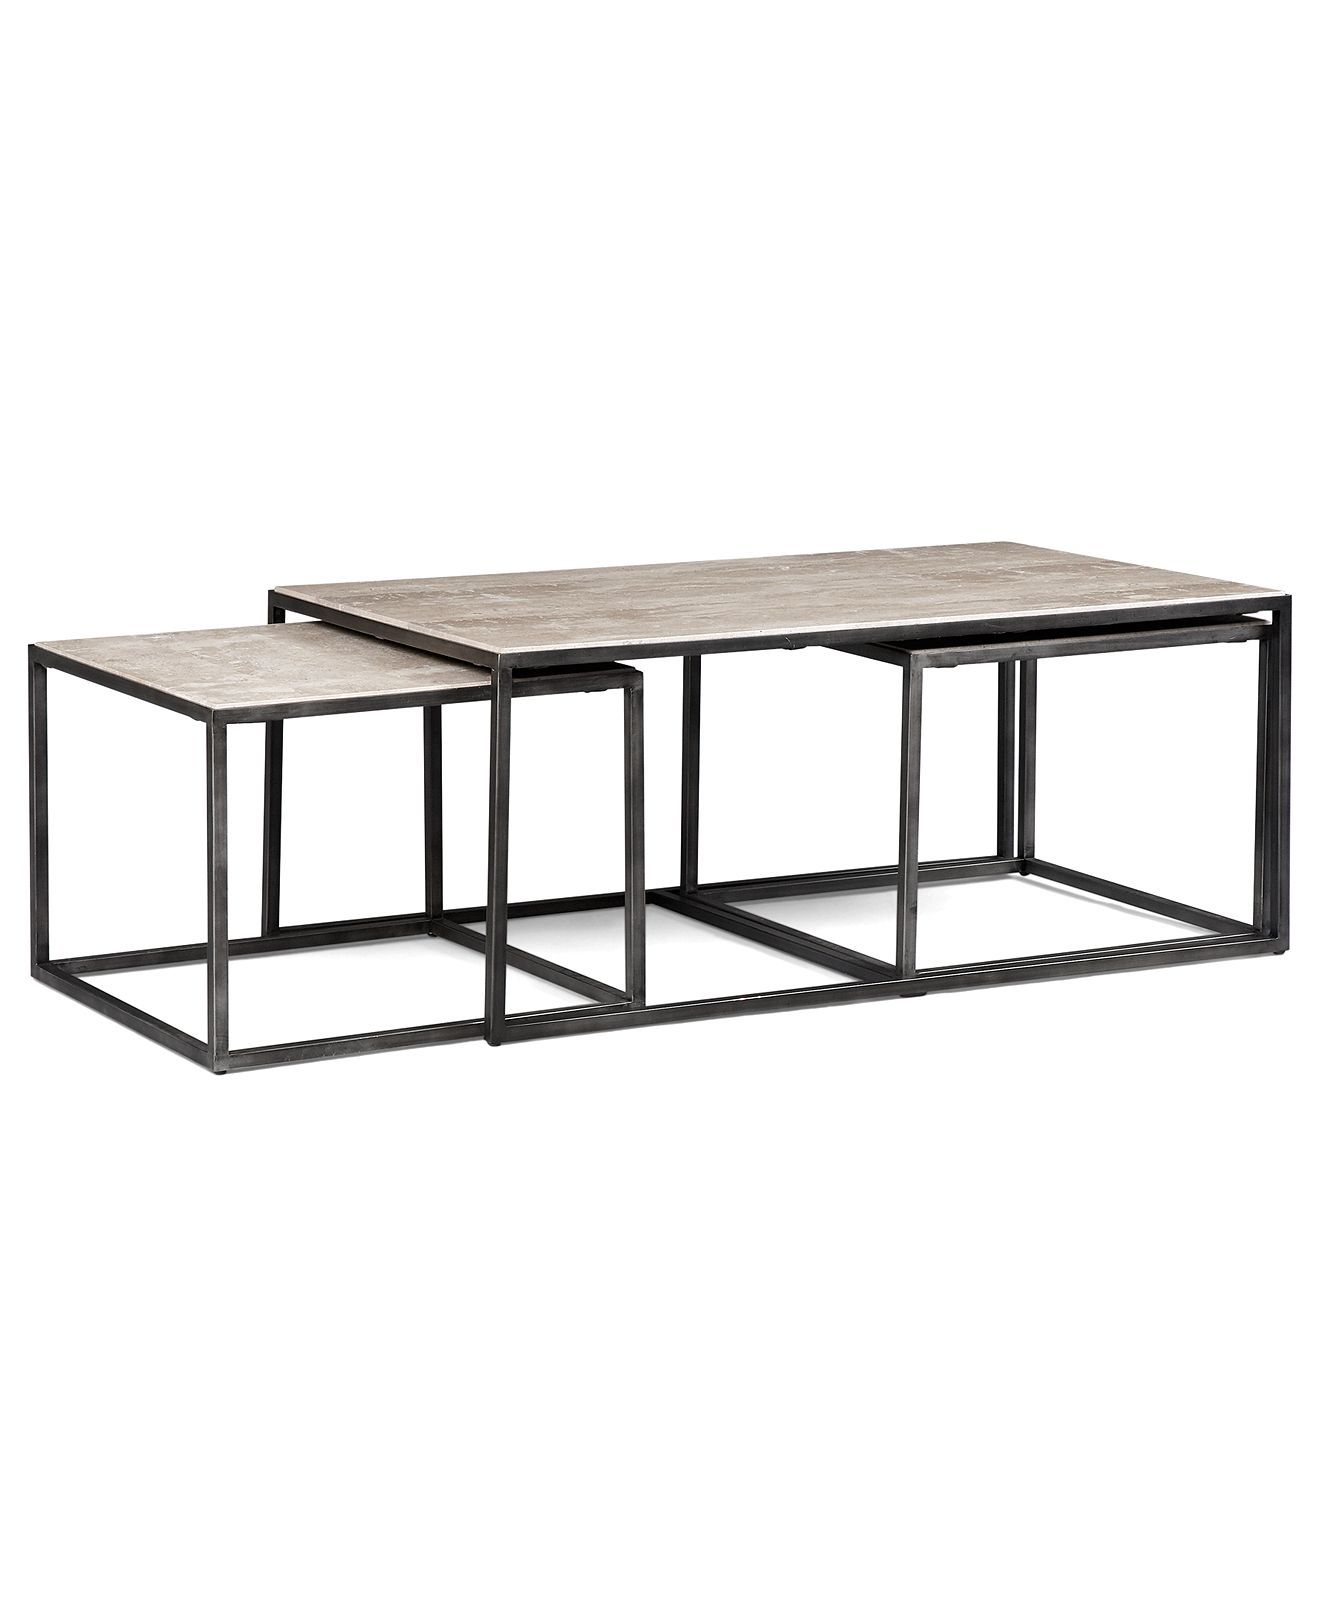 Charmant Monterey Coffee Table, Rectangular Nesting   Furniture   Macyu0027s